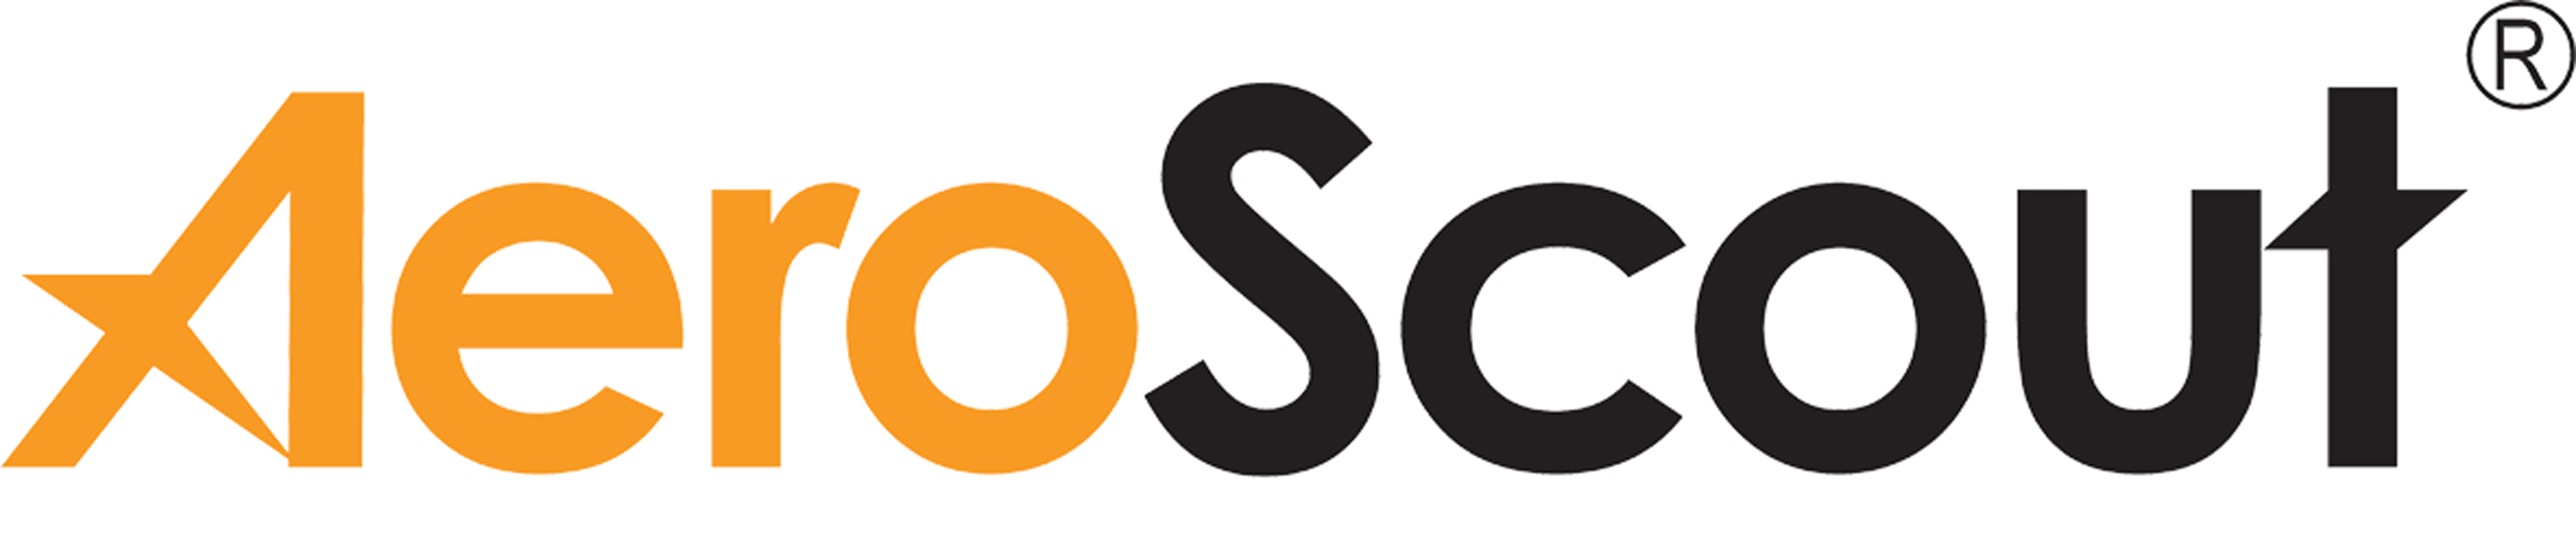 Aeroscout_logo